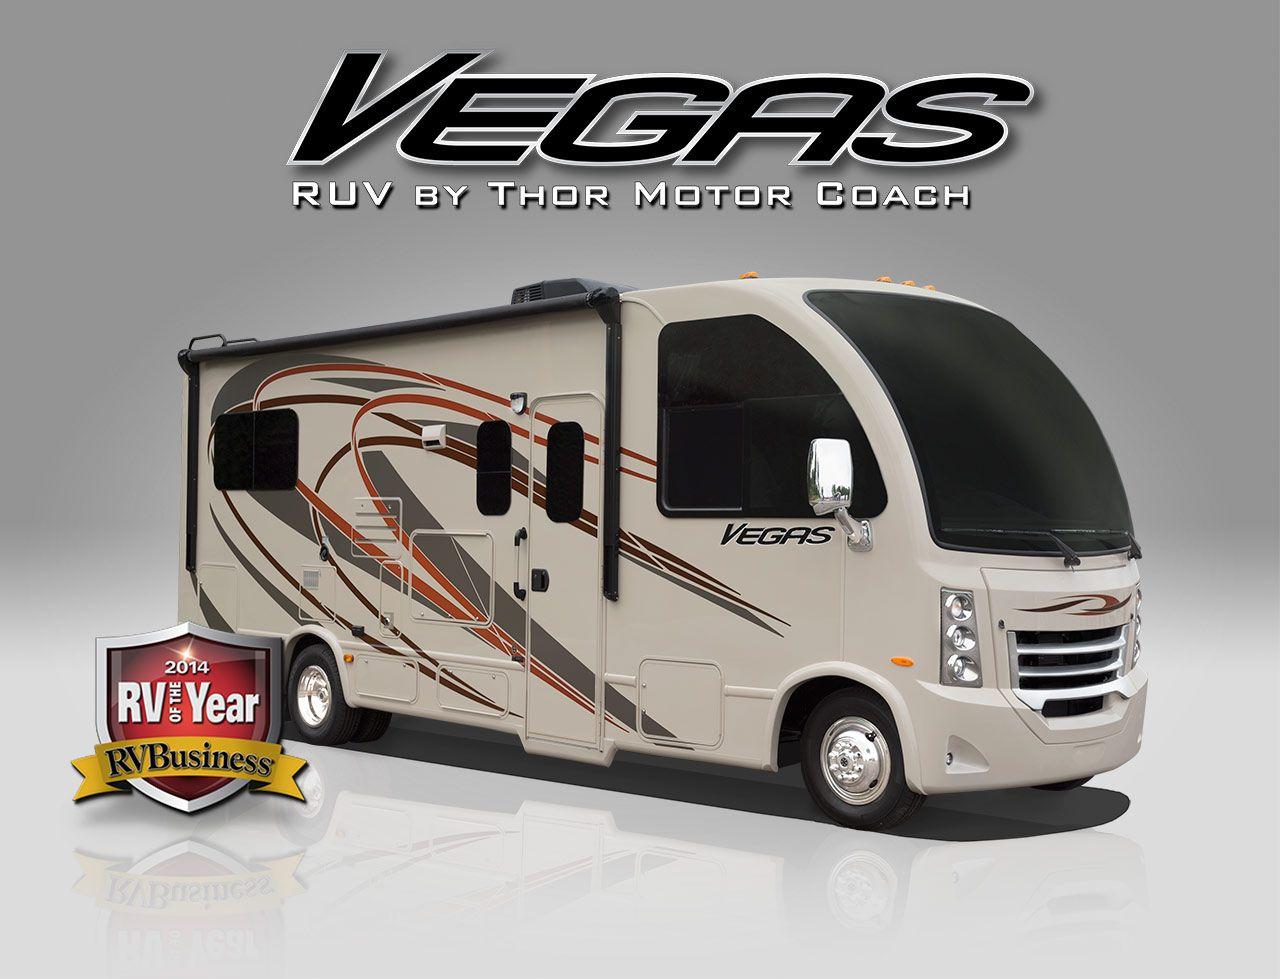 2015 vegas ruv motorhomes class a rv by thor motor coach for Class a motor coach